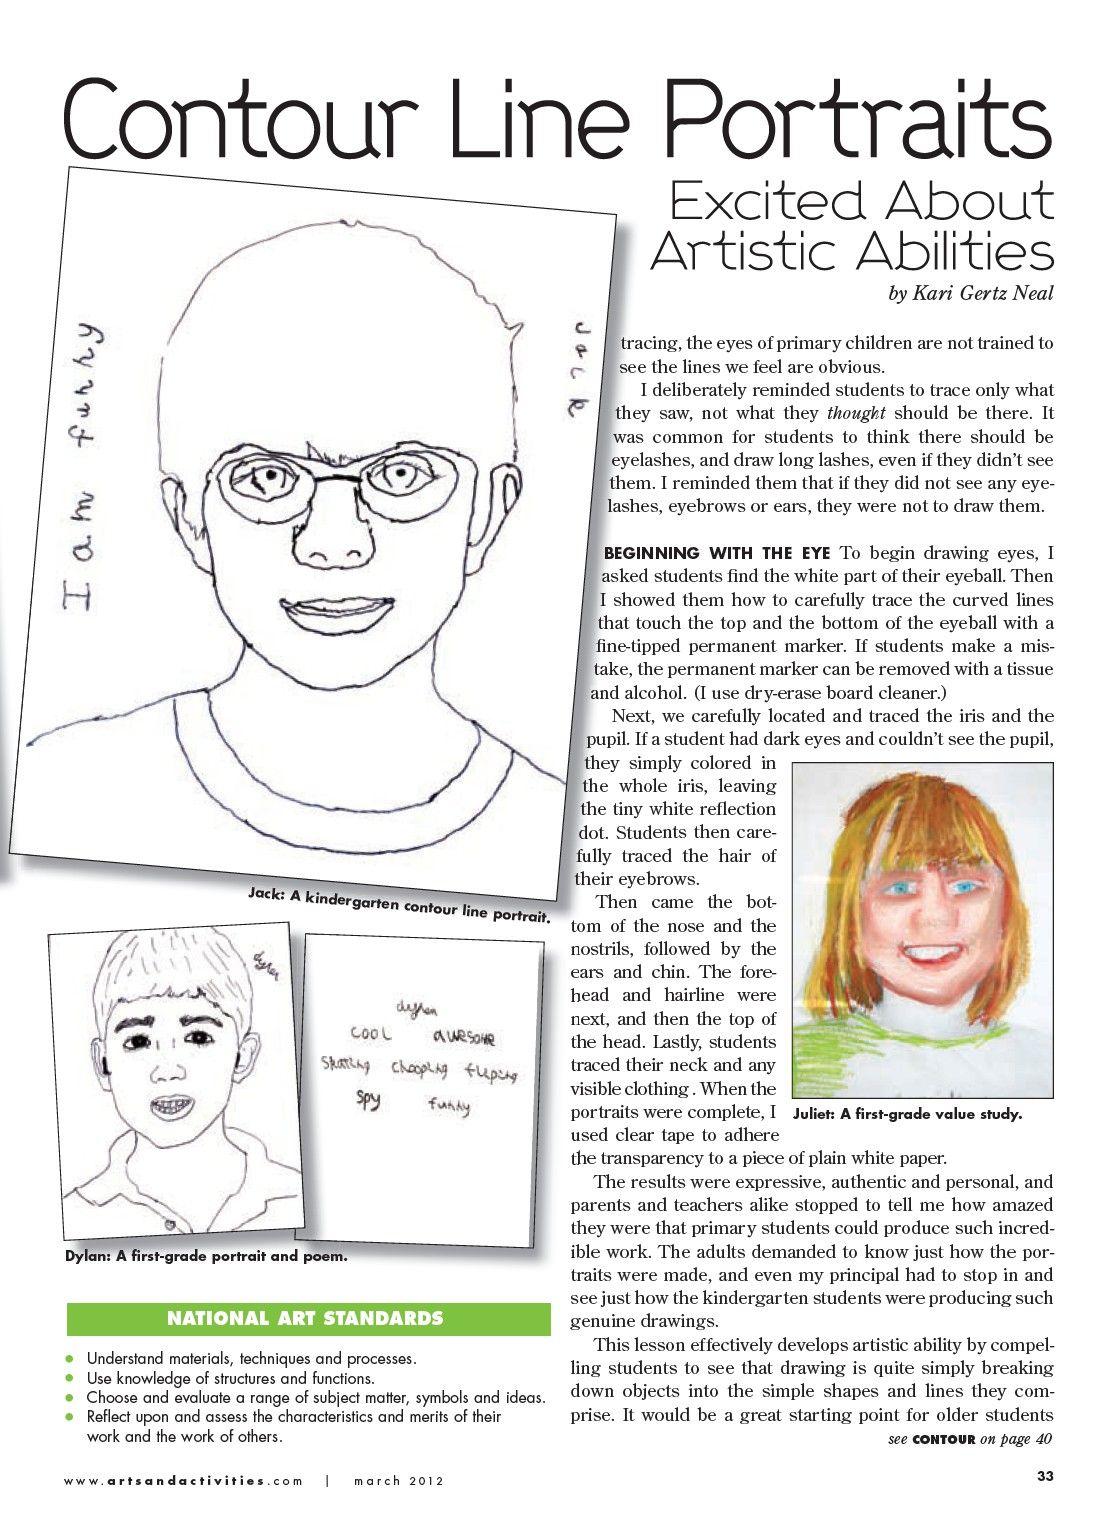 Contour Line Portraits Issue Of School Arts